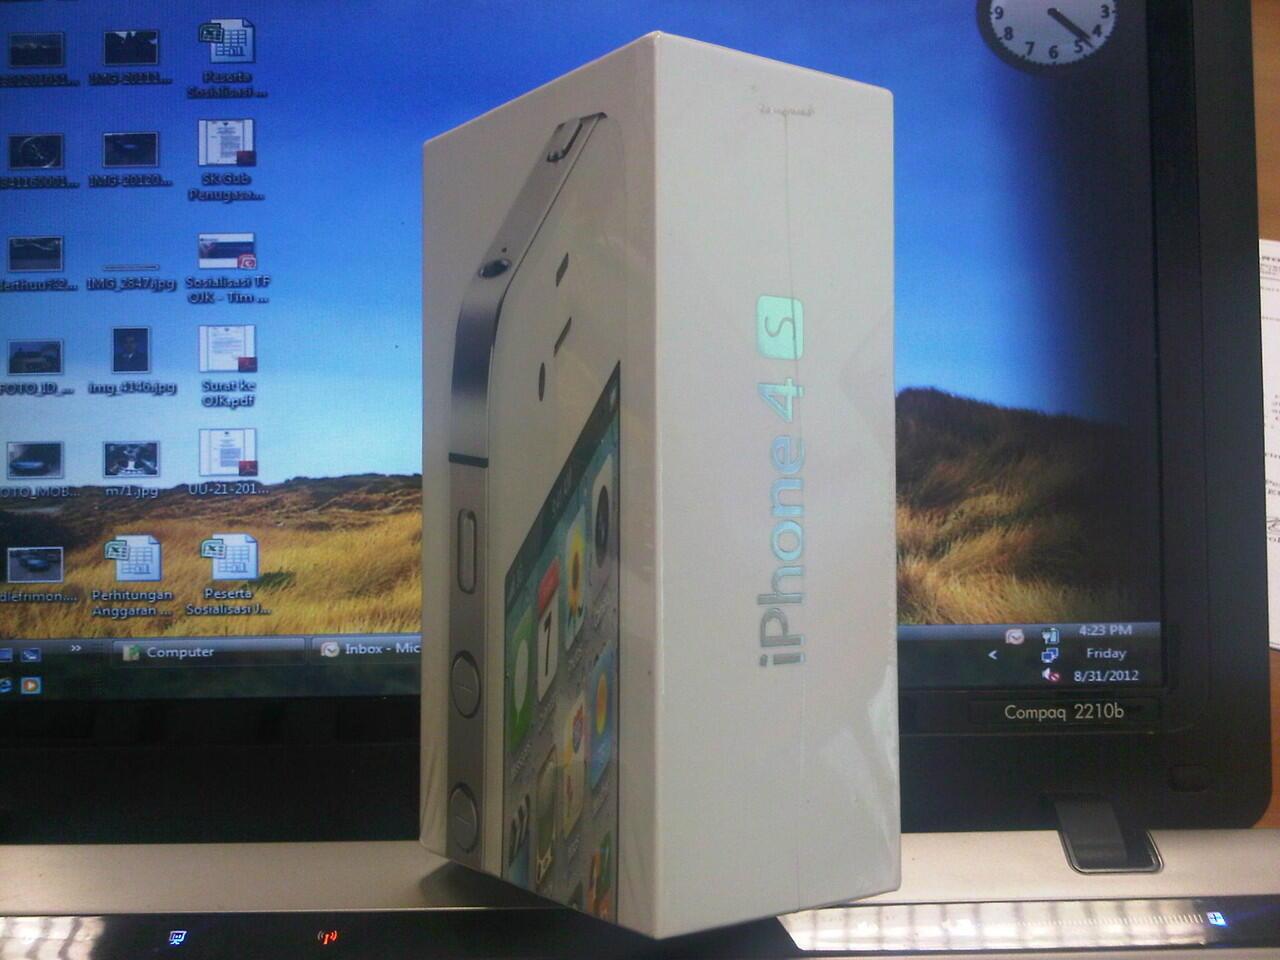 Jual BNIB IPHONE 4GS-WHITE-64GB, SIAPA CEPAT DIA DAPAT !!!